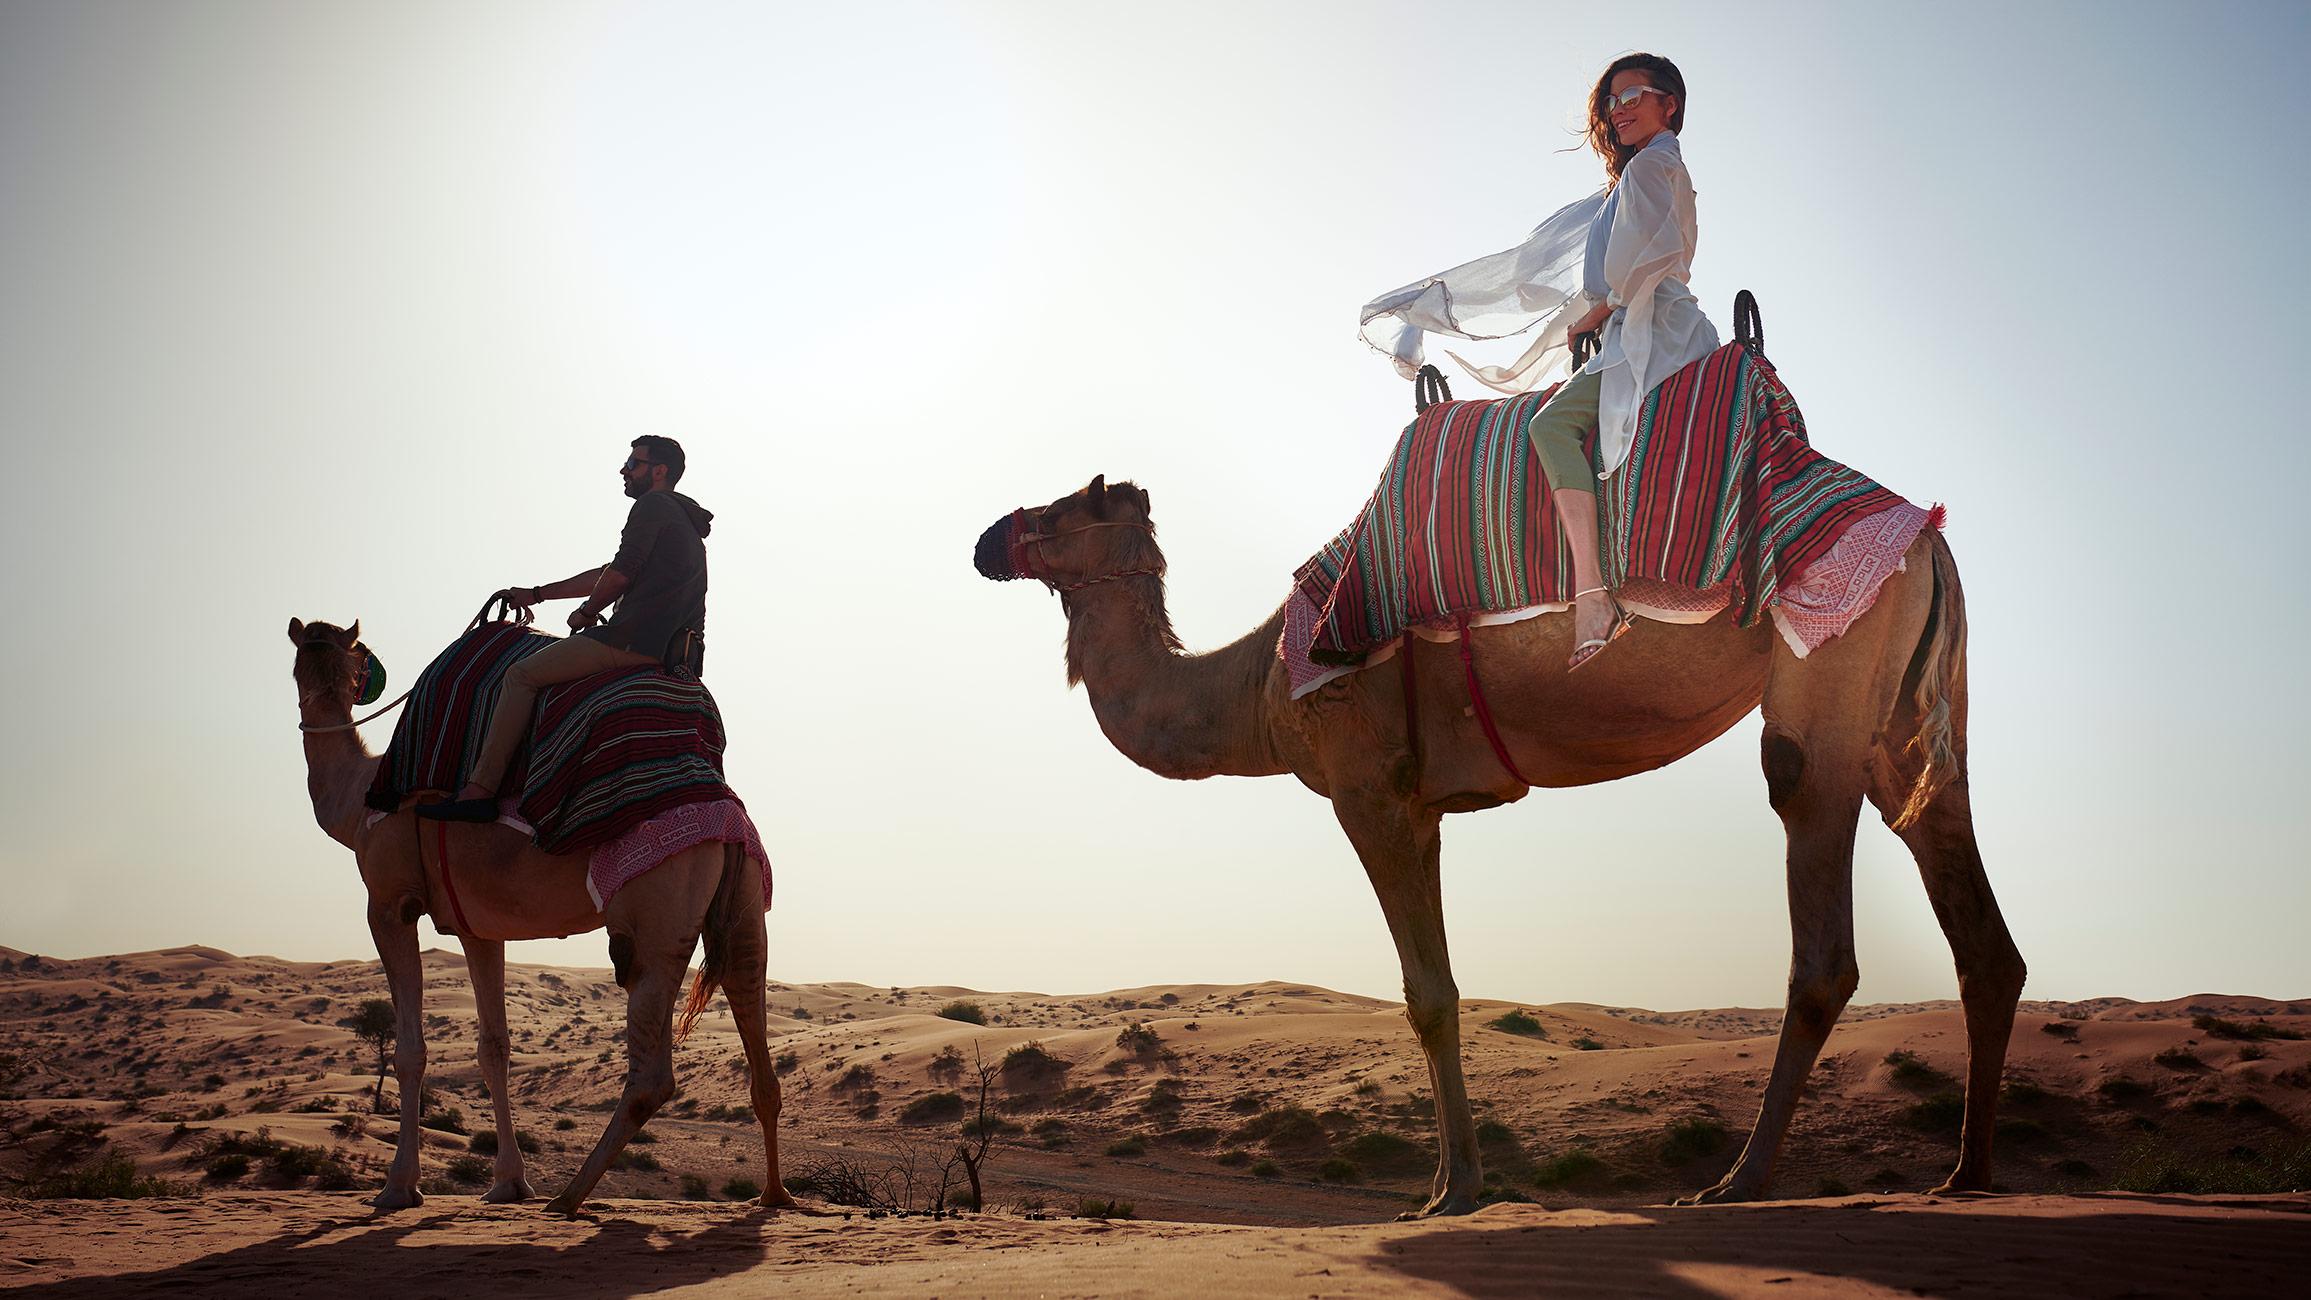 Ras Al Khaimah Tourism Board ad